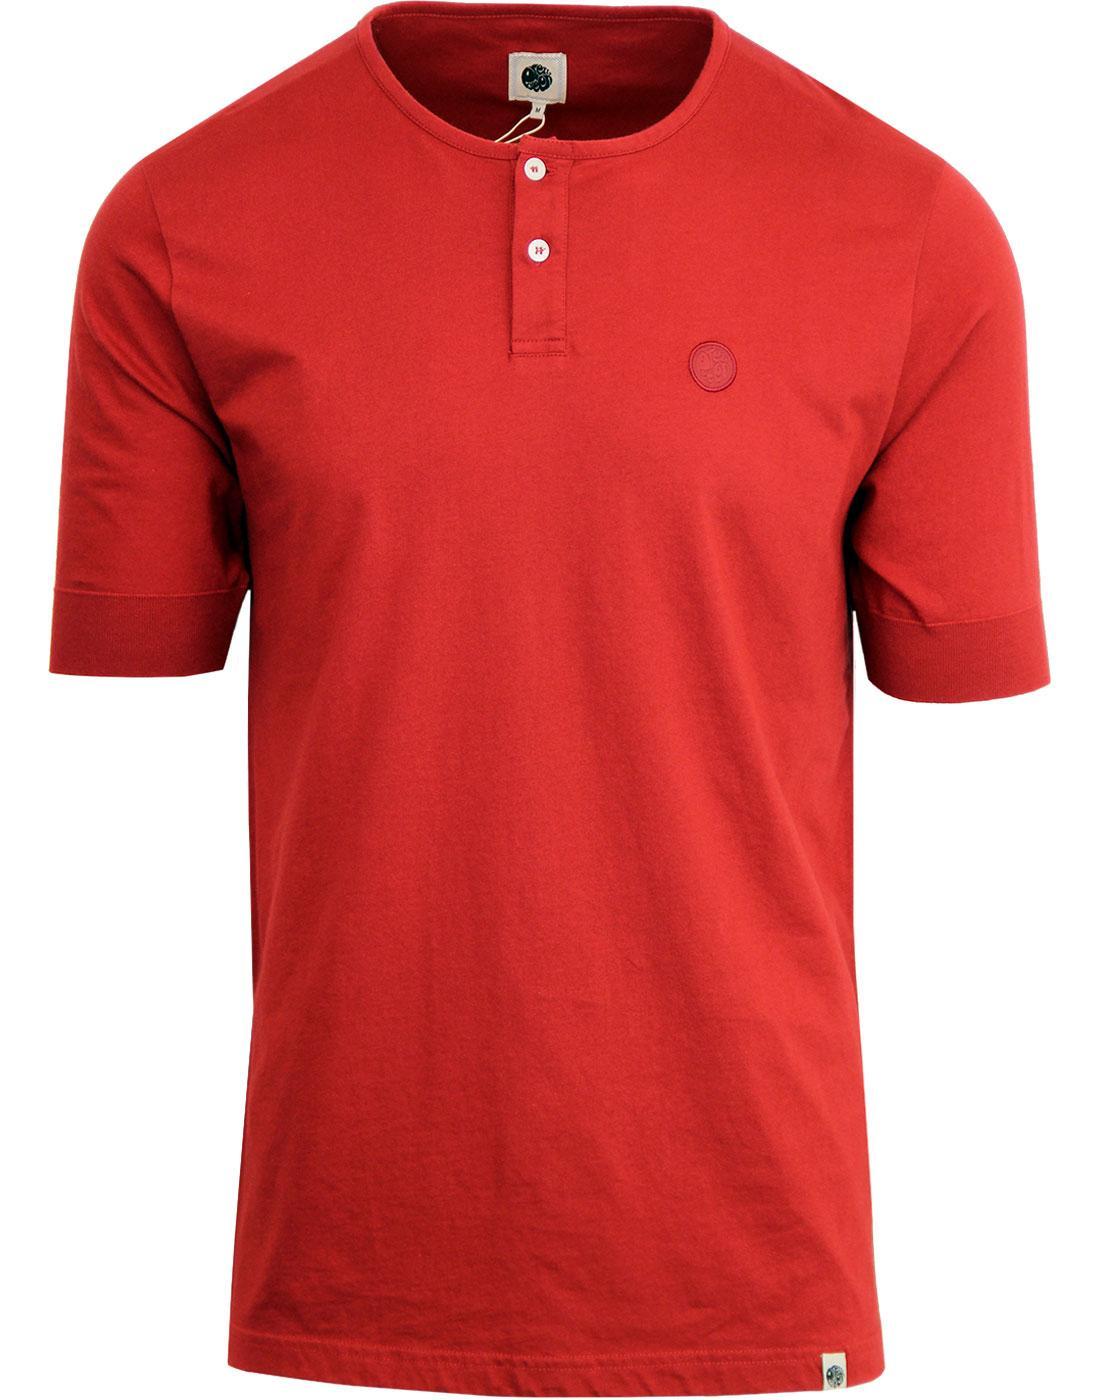 PRETTY GREEN Retro 60's Grandad Collar T-Shirt RED